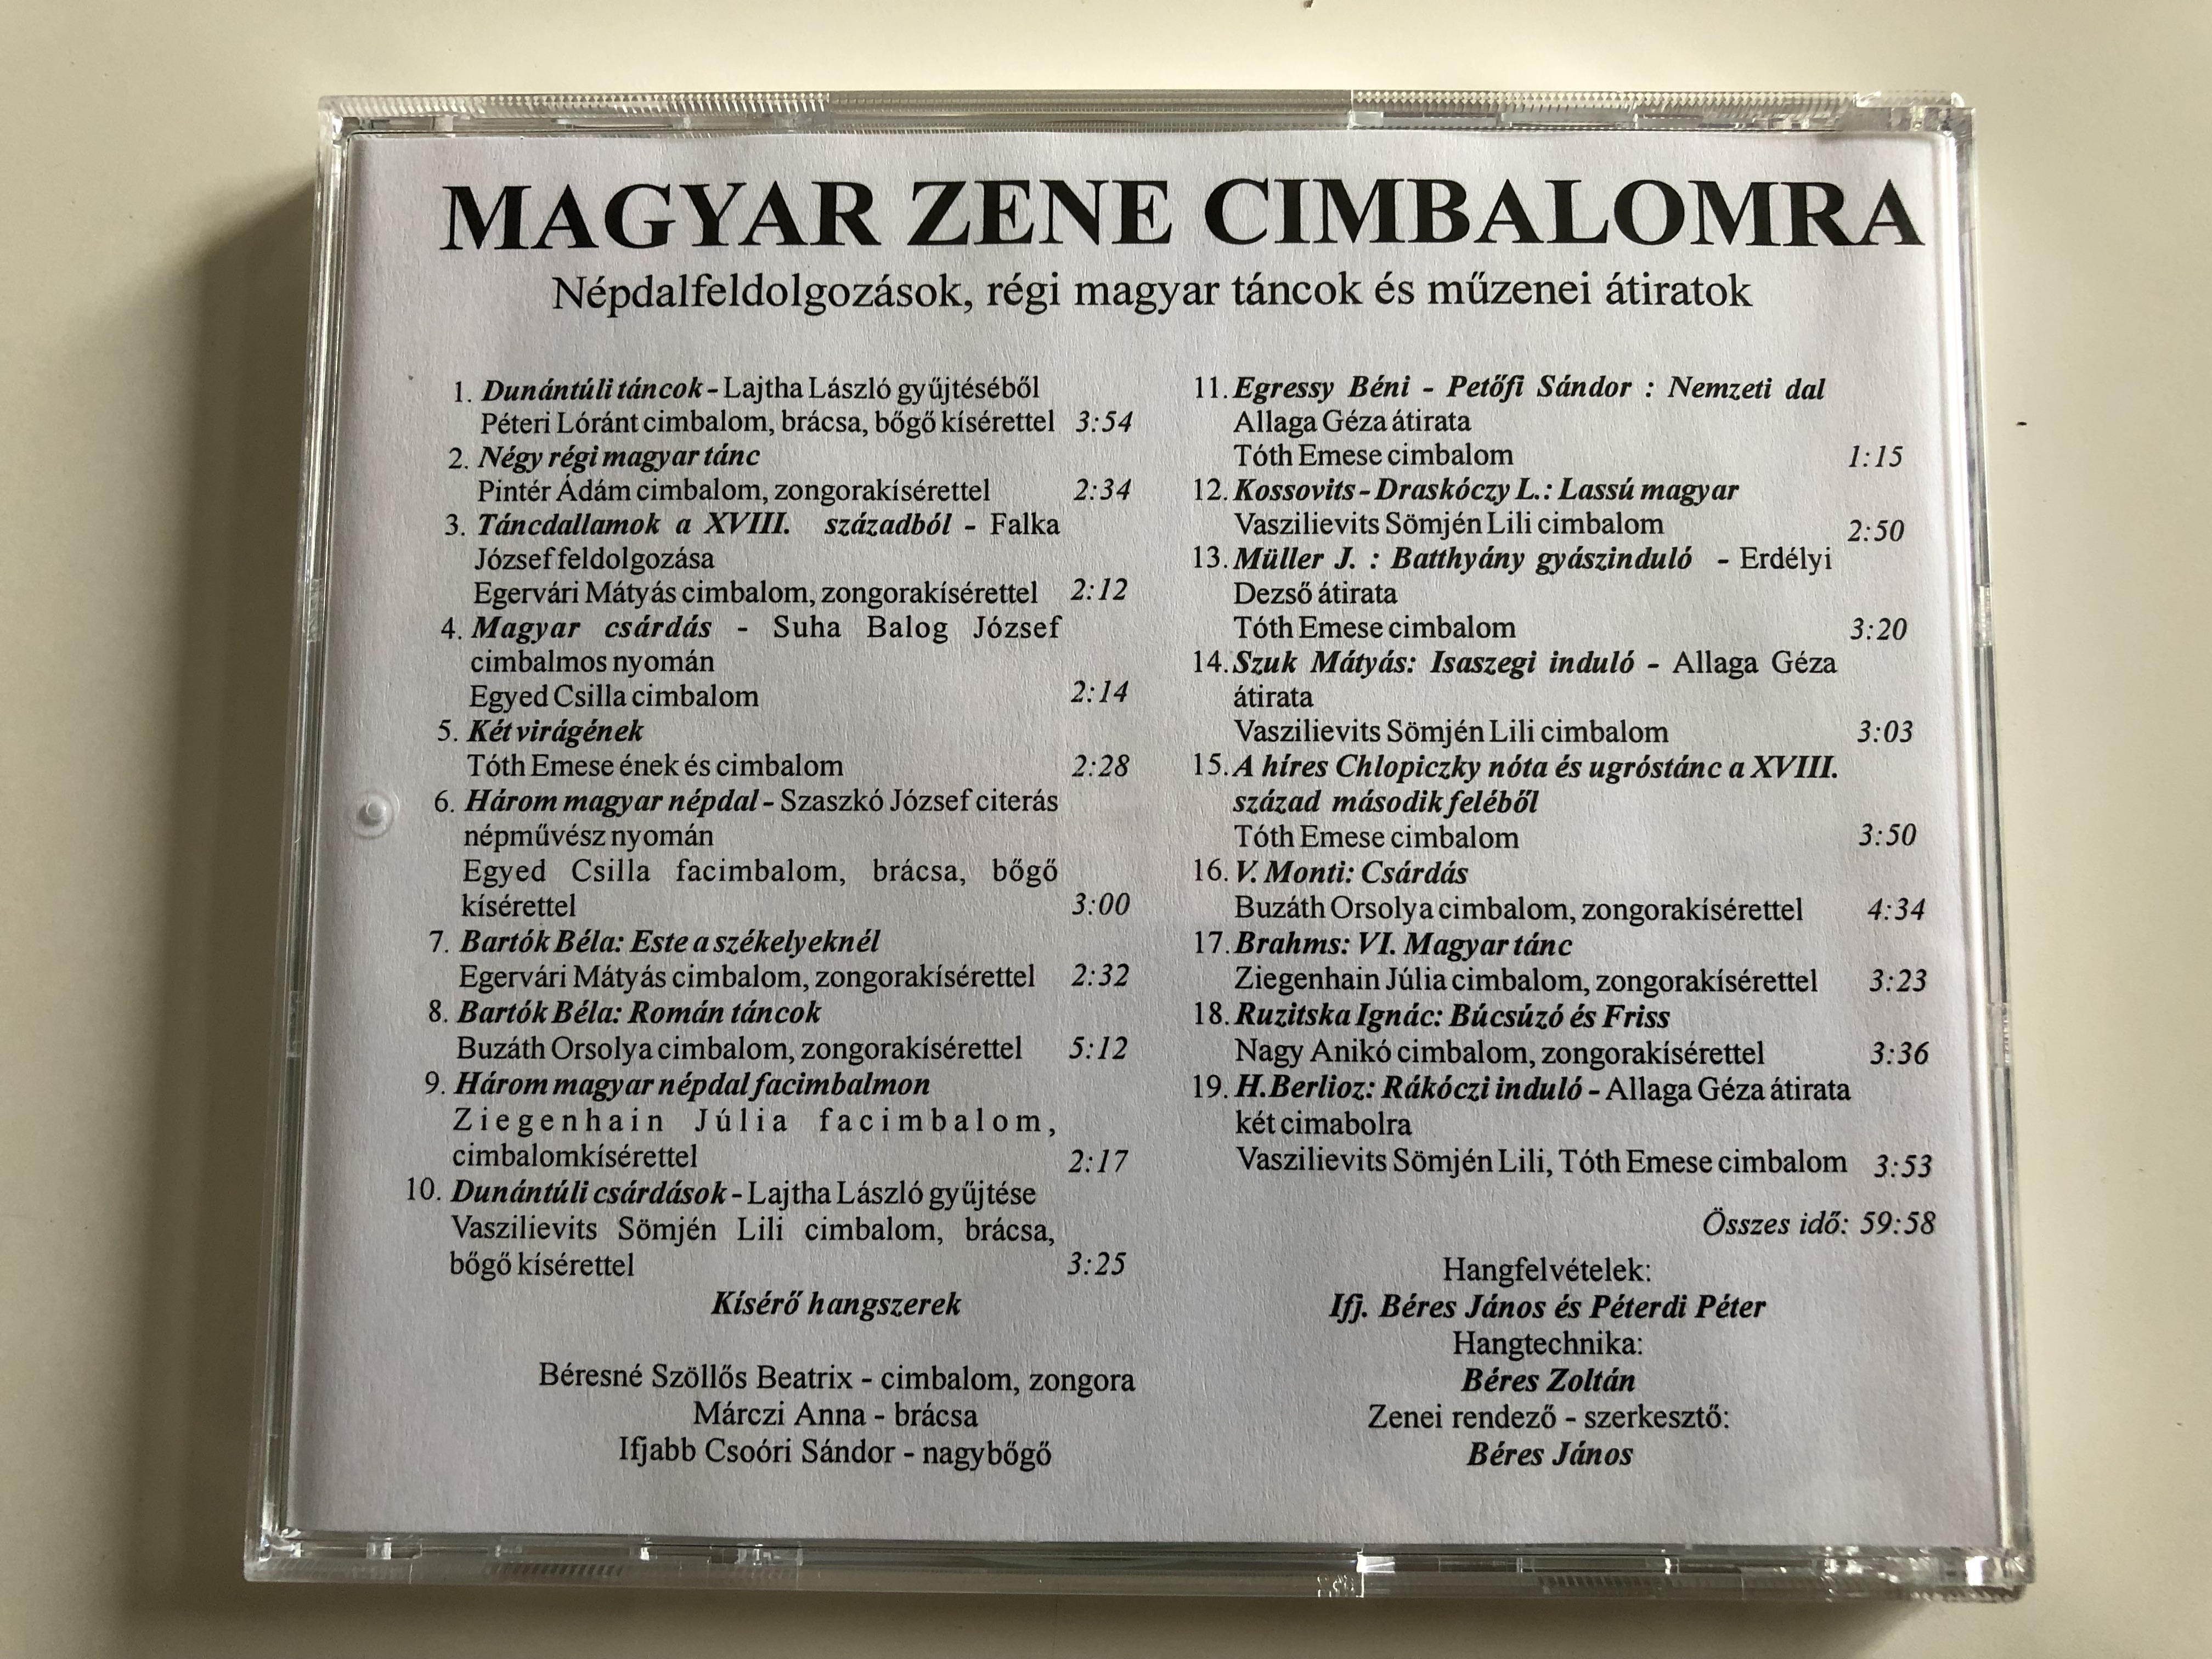 magyar-zene-cimbalomra-n-pdalfeldolgoz-sok-r-gi-magyar-t-ncok-s-m-zenei-tiratok-b-resn-sz-ll-beatrix-r-cz-alad-r-d-jas-n-vend-kei-muzsik-lnak-audio-cd-2004-7-.jpg